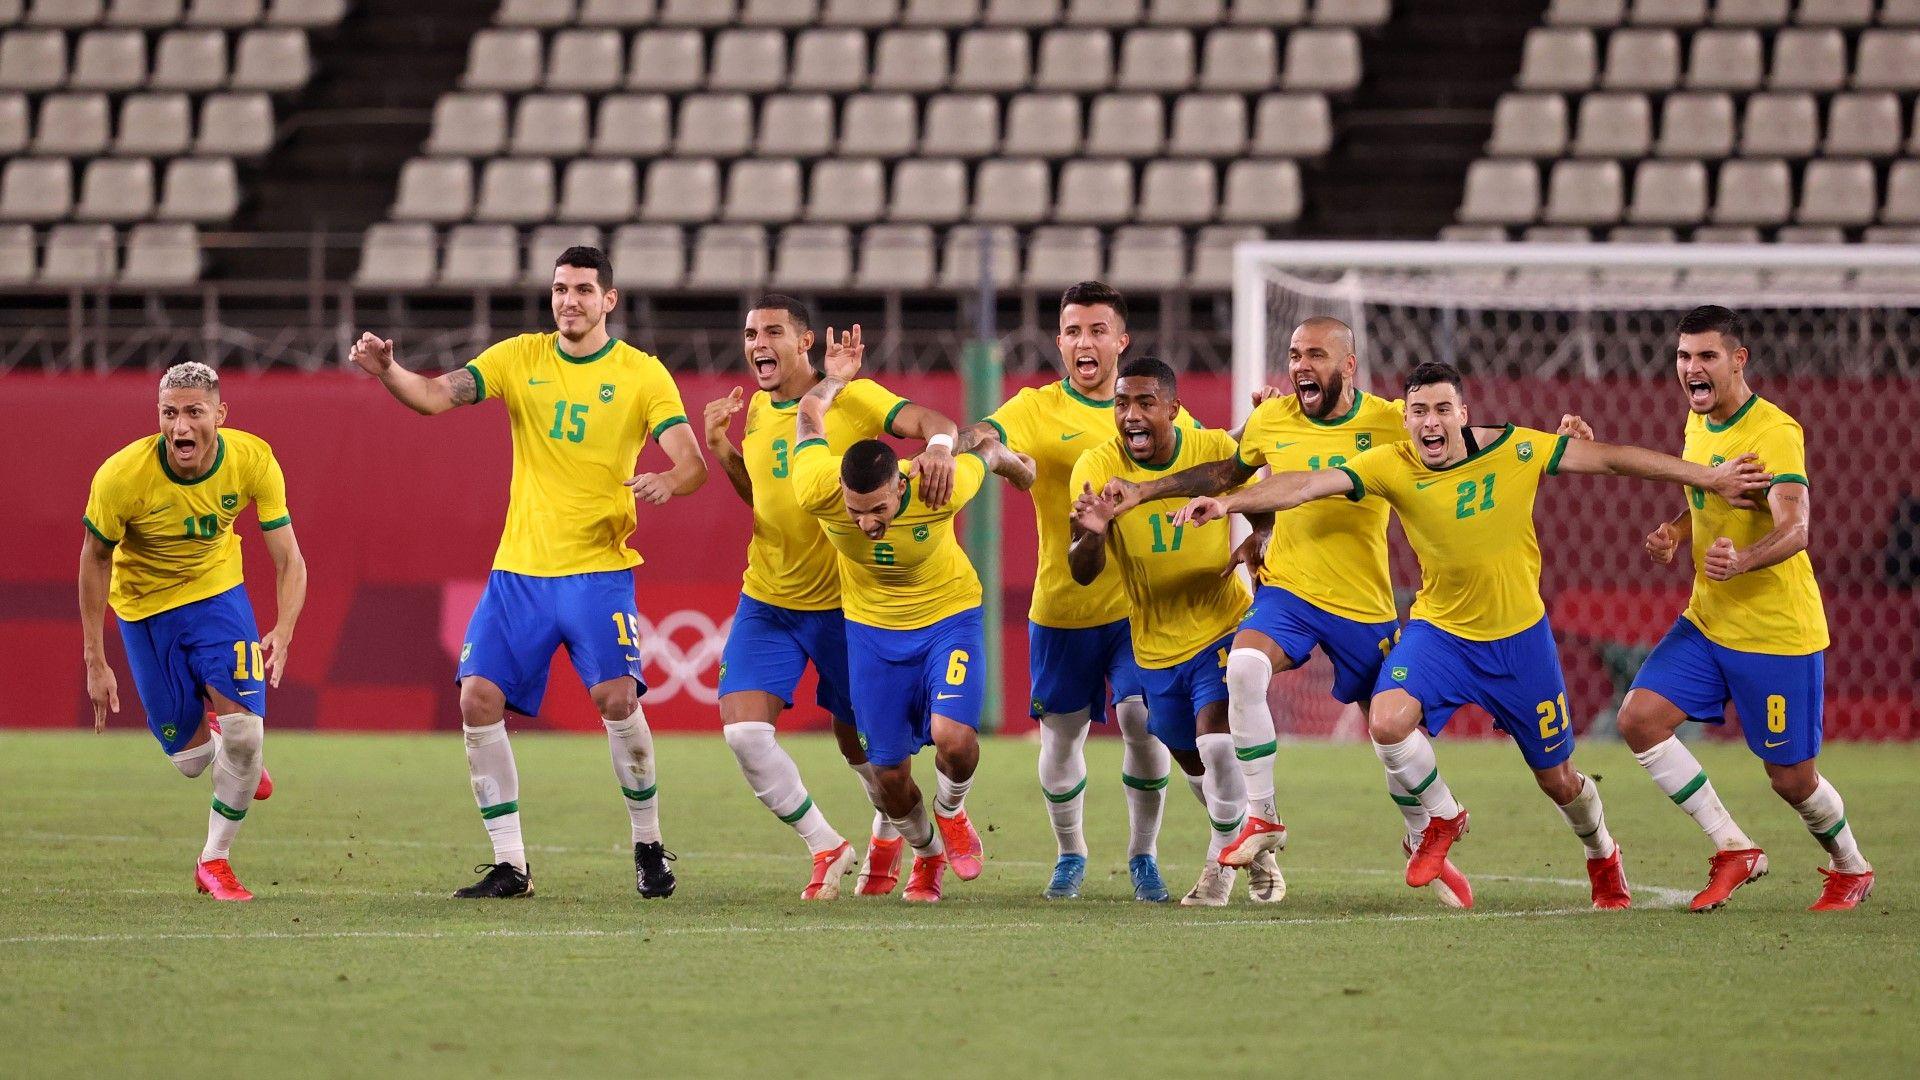 Кабаков даде и отмени дузпа, драма прати Бразилия на трети пореден финал